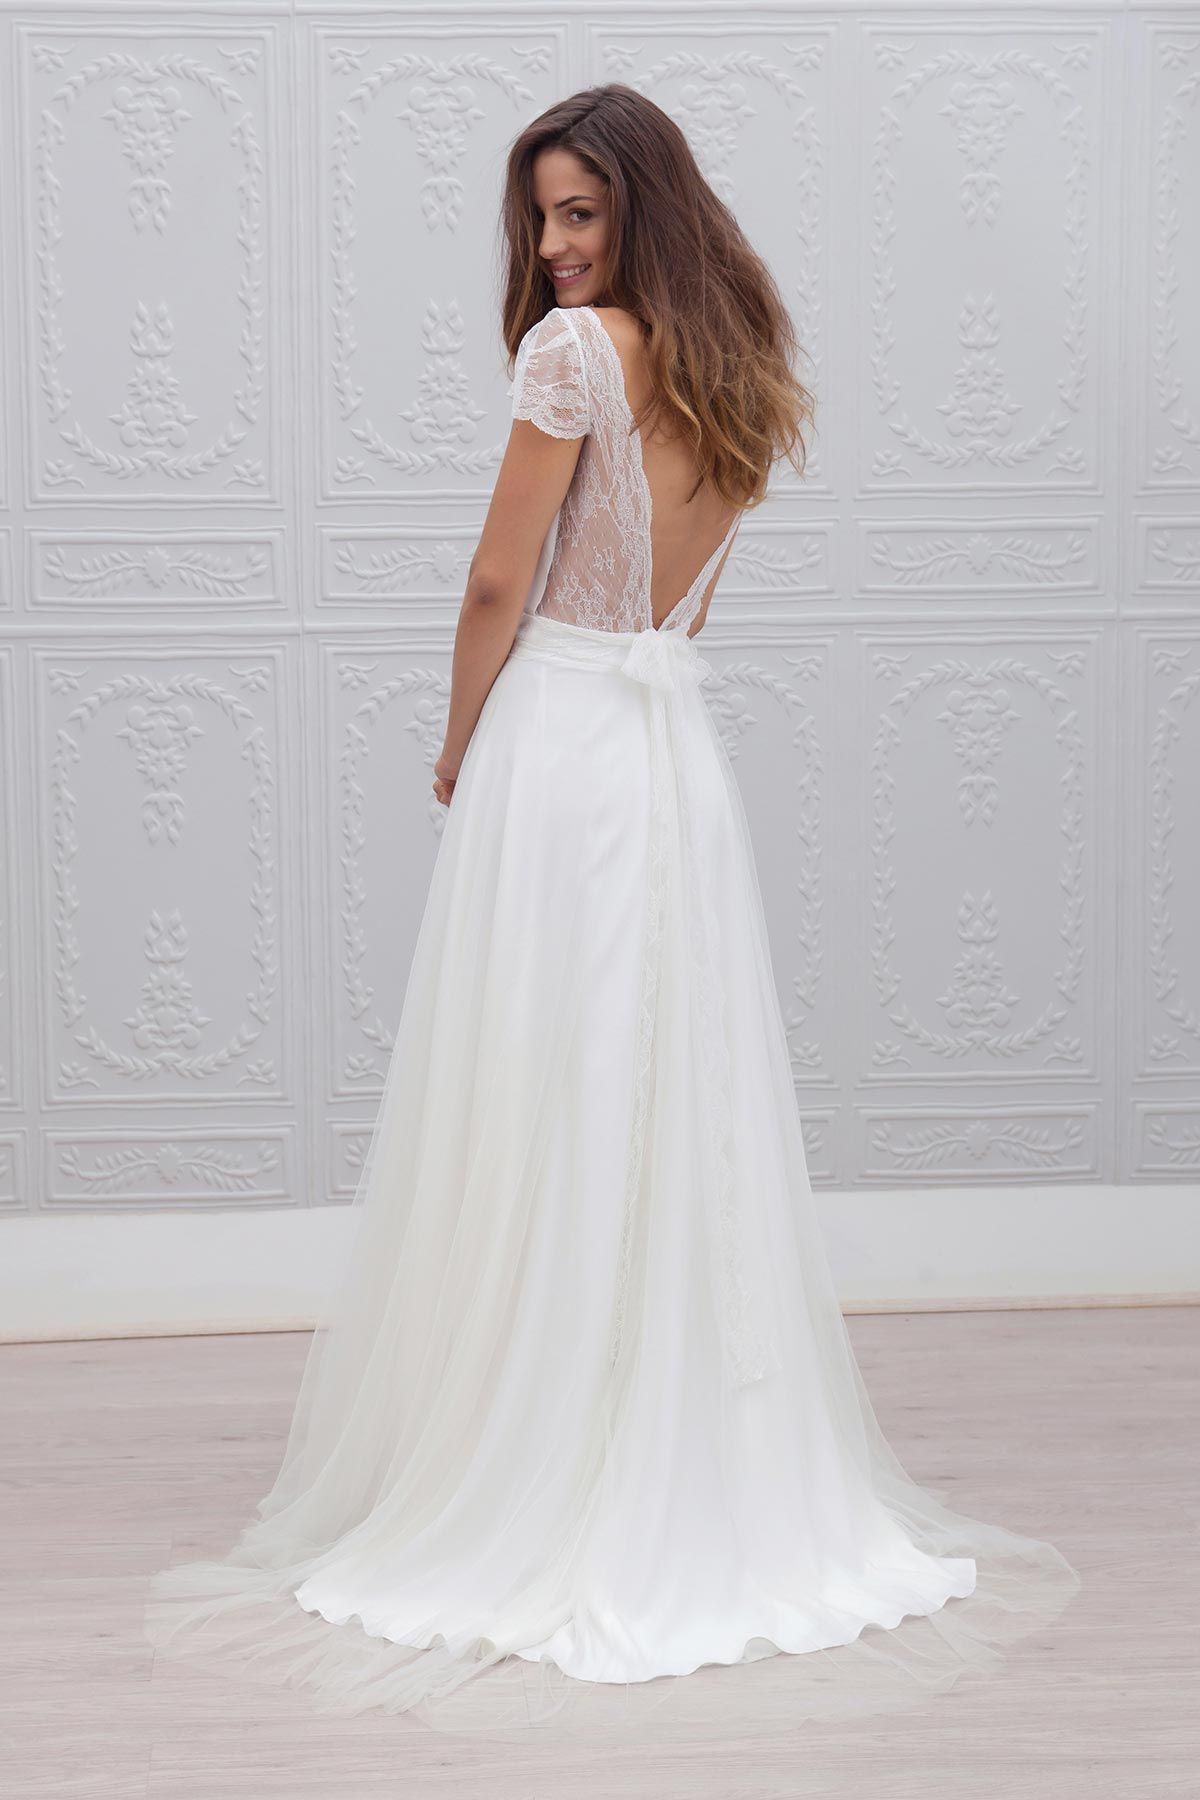 marie laporte collection 2015 robe de mari e 2015 wedding dresses wedding dress and wedding. Black Bedroom Furniture Sets. Home Design Ideas